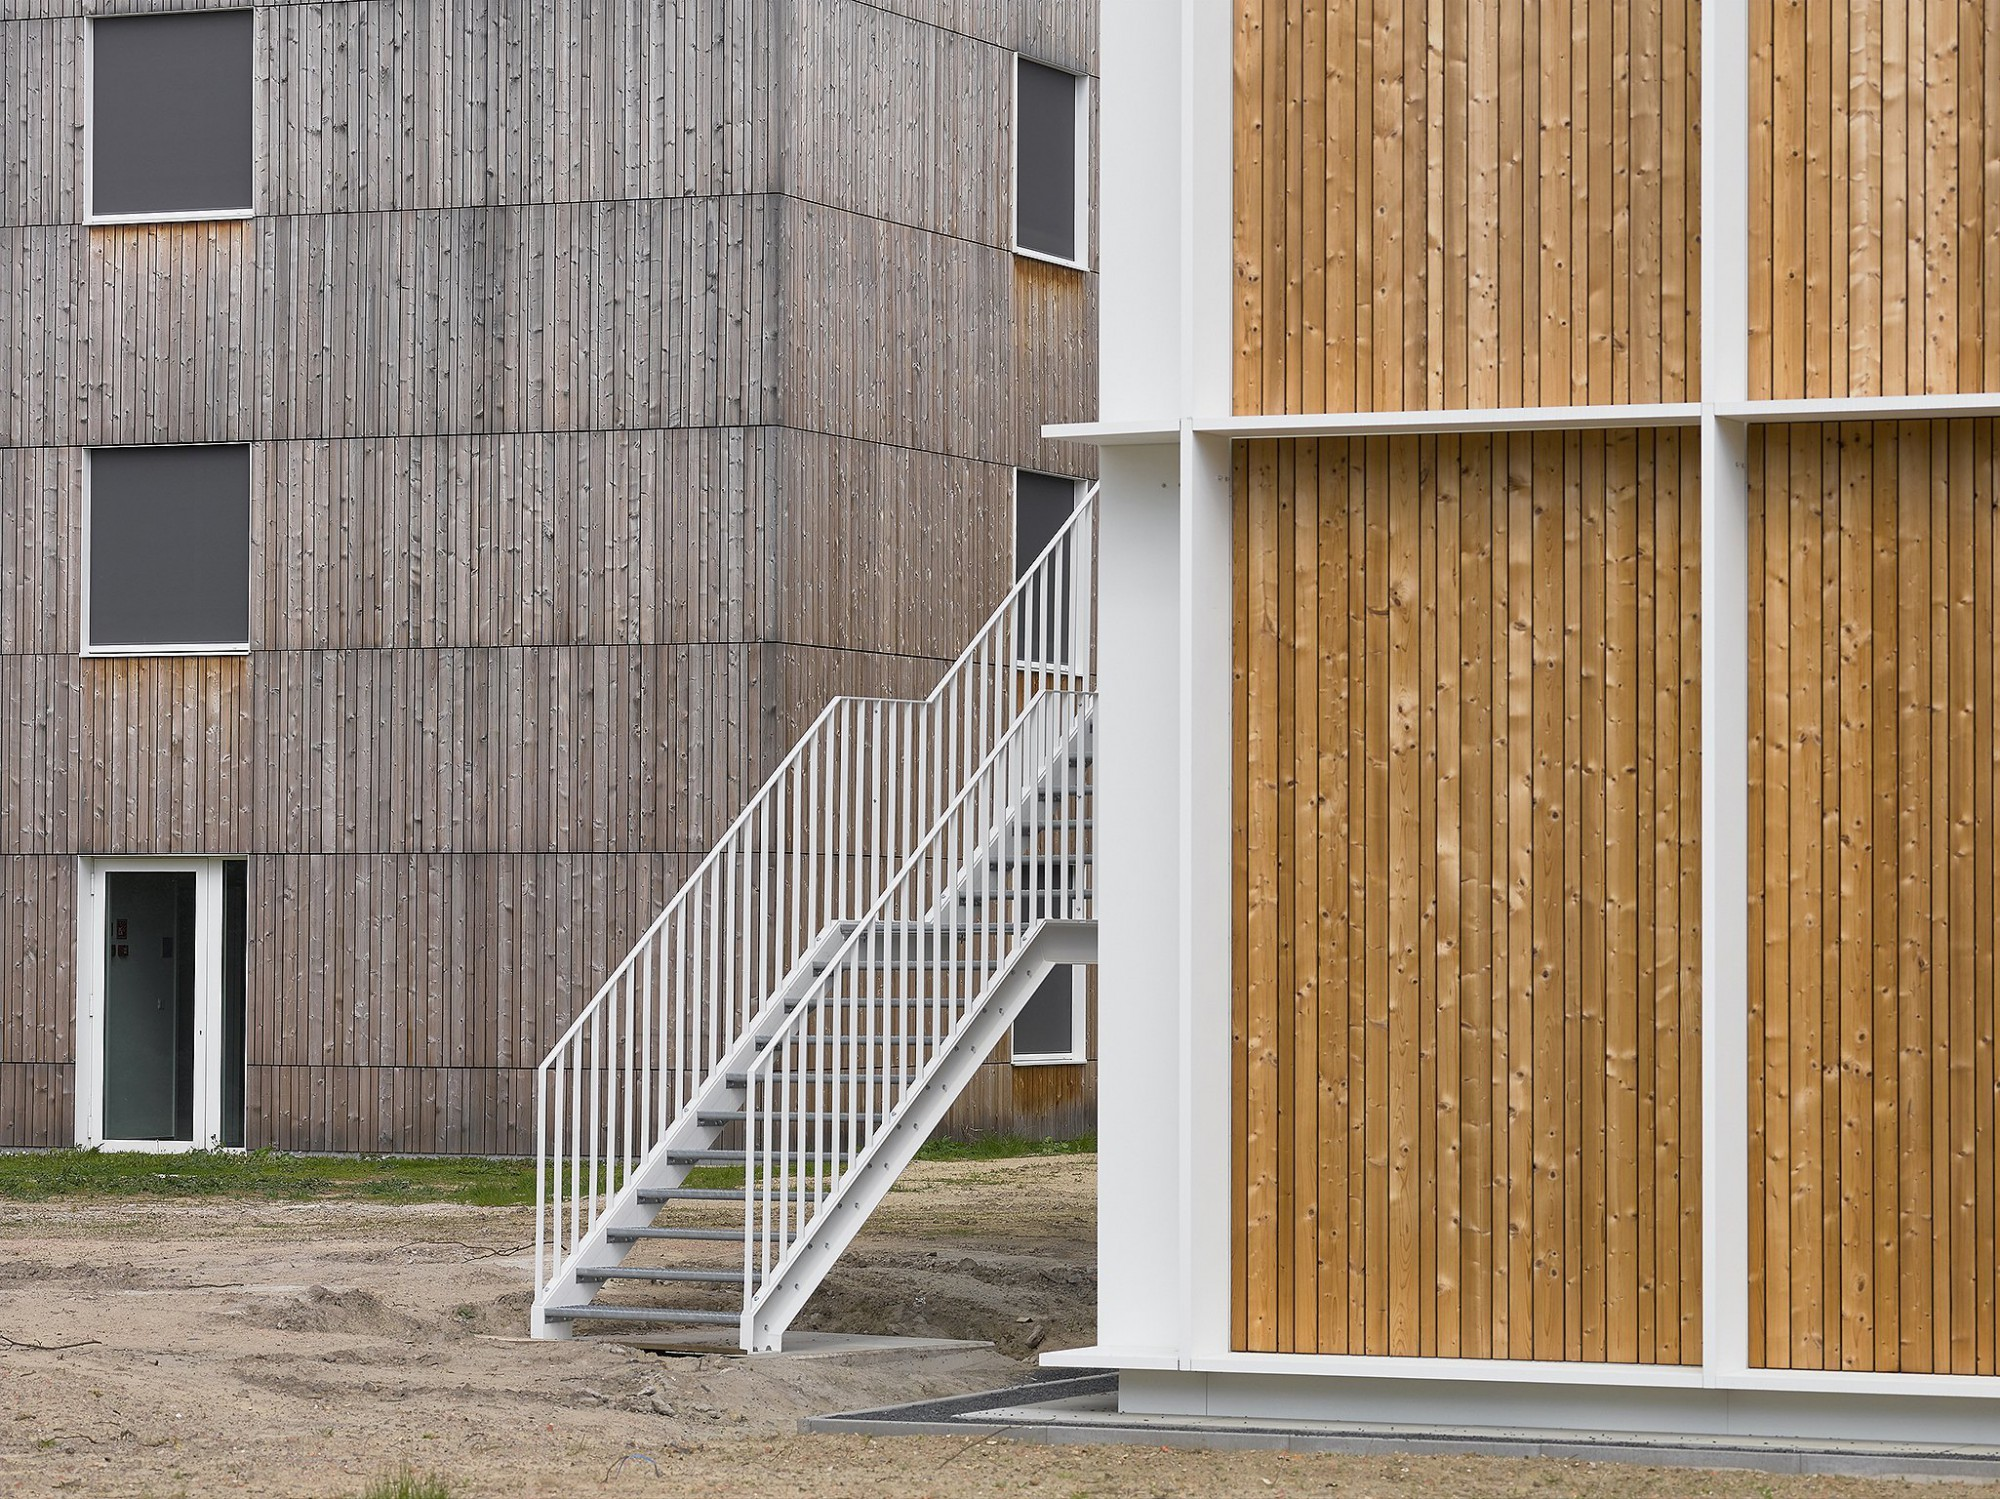 Afbeelding: Architectuur fotografie, Emmaus Duffel, voor atelier M Architects + Planners.